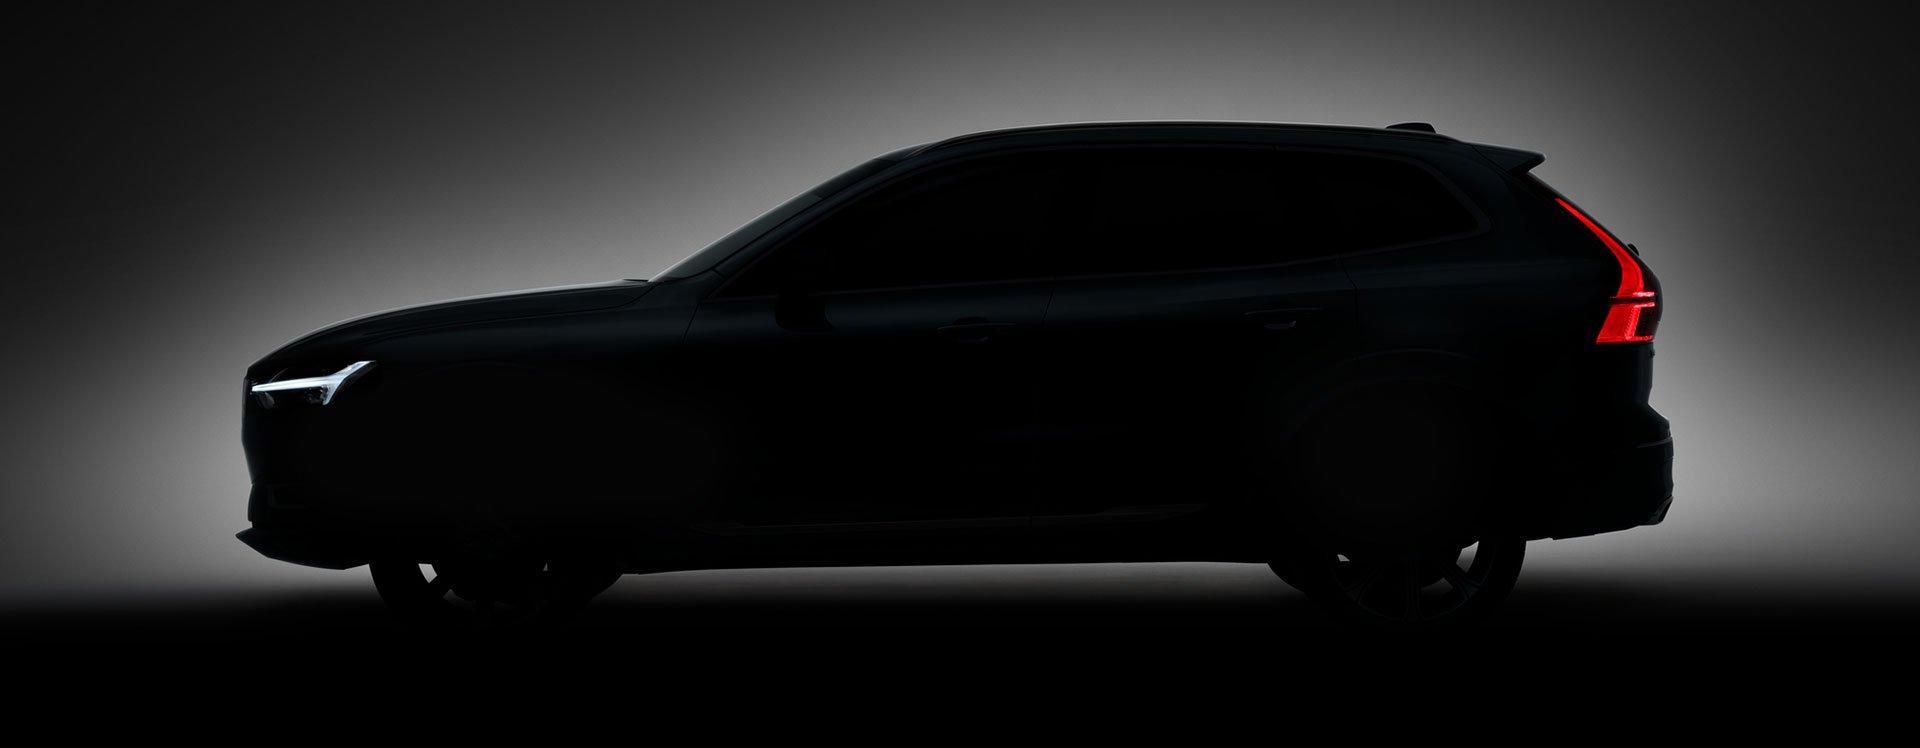 header-oferte-speciale-excellence-cars-volvo.jpg